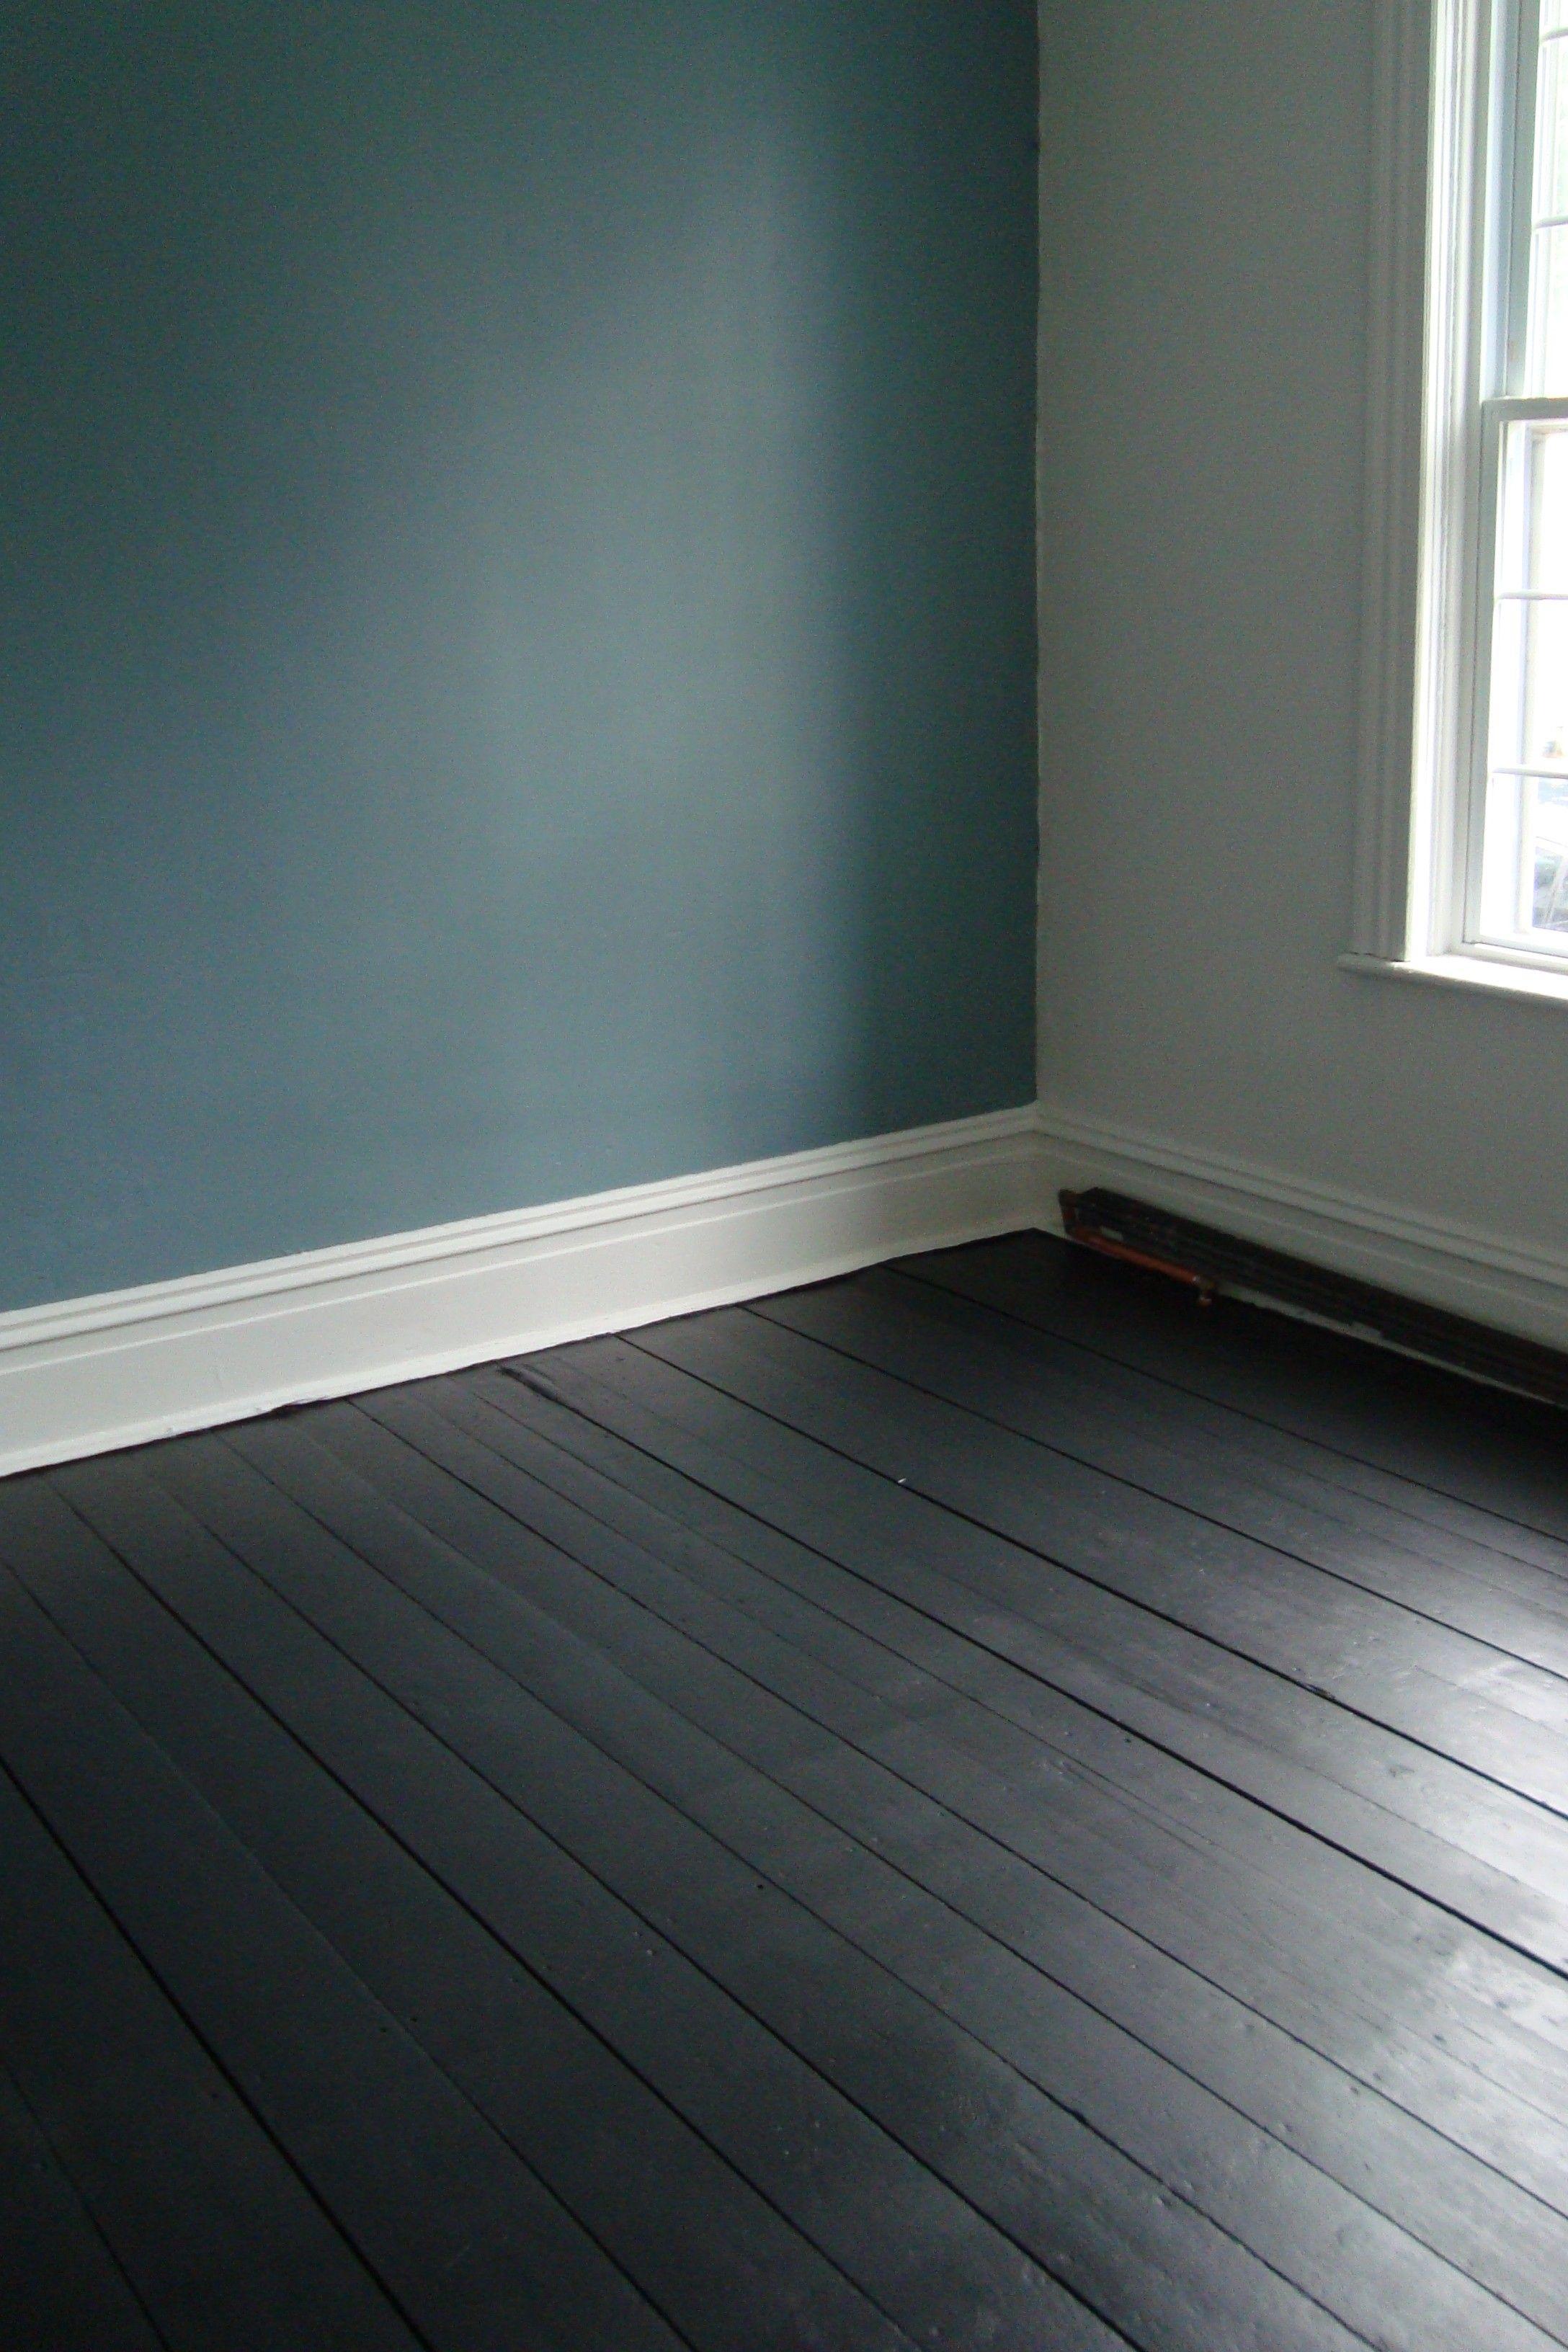 Carpet or floorboards in bedroom